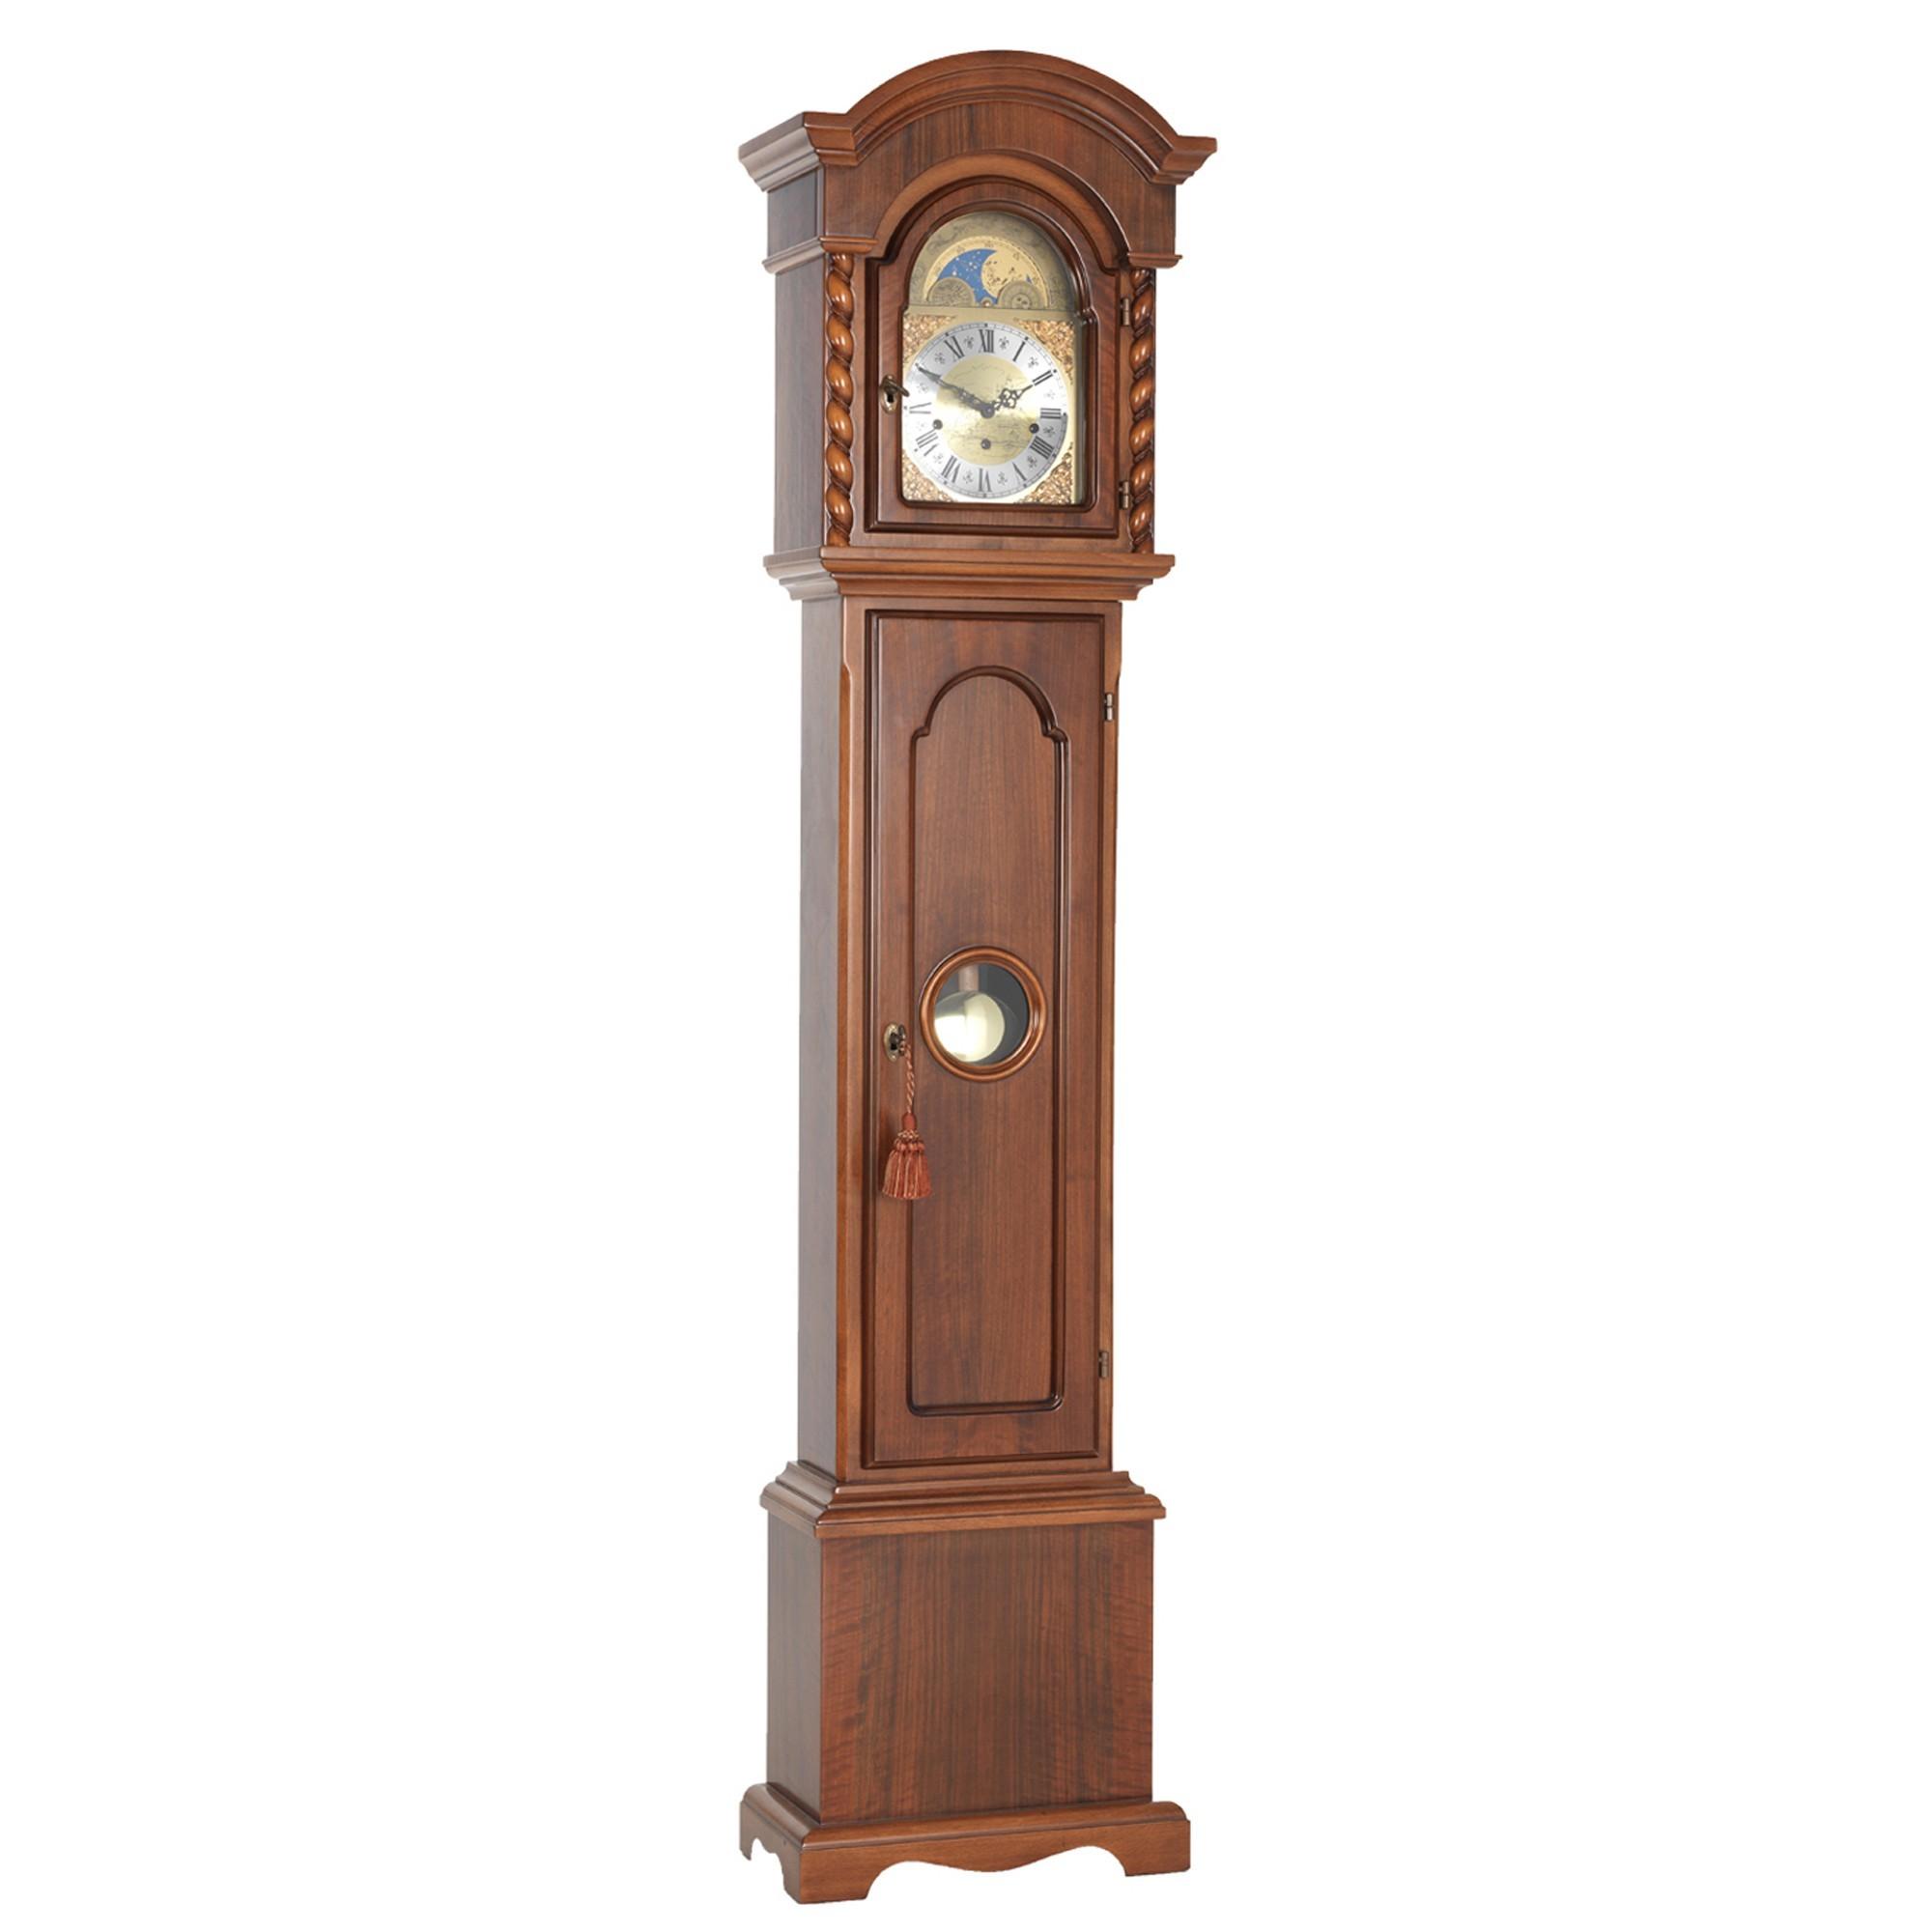 corinthian walnut finish grandmother clock